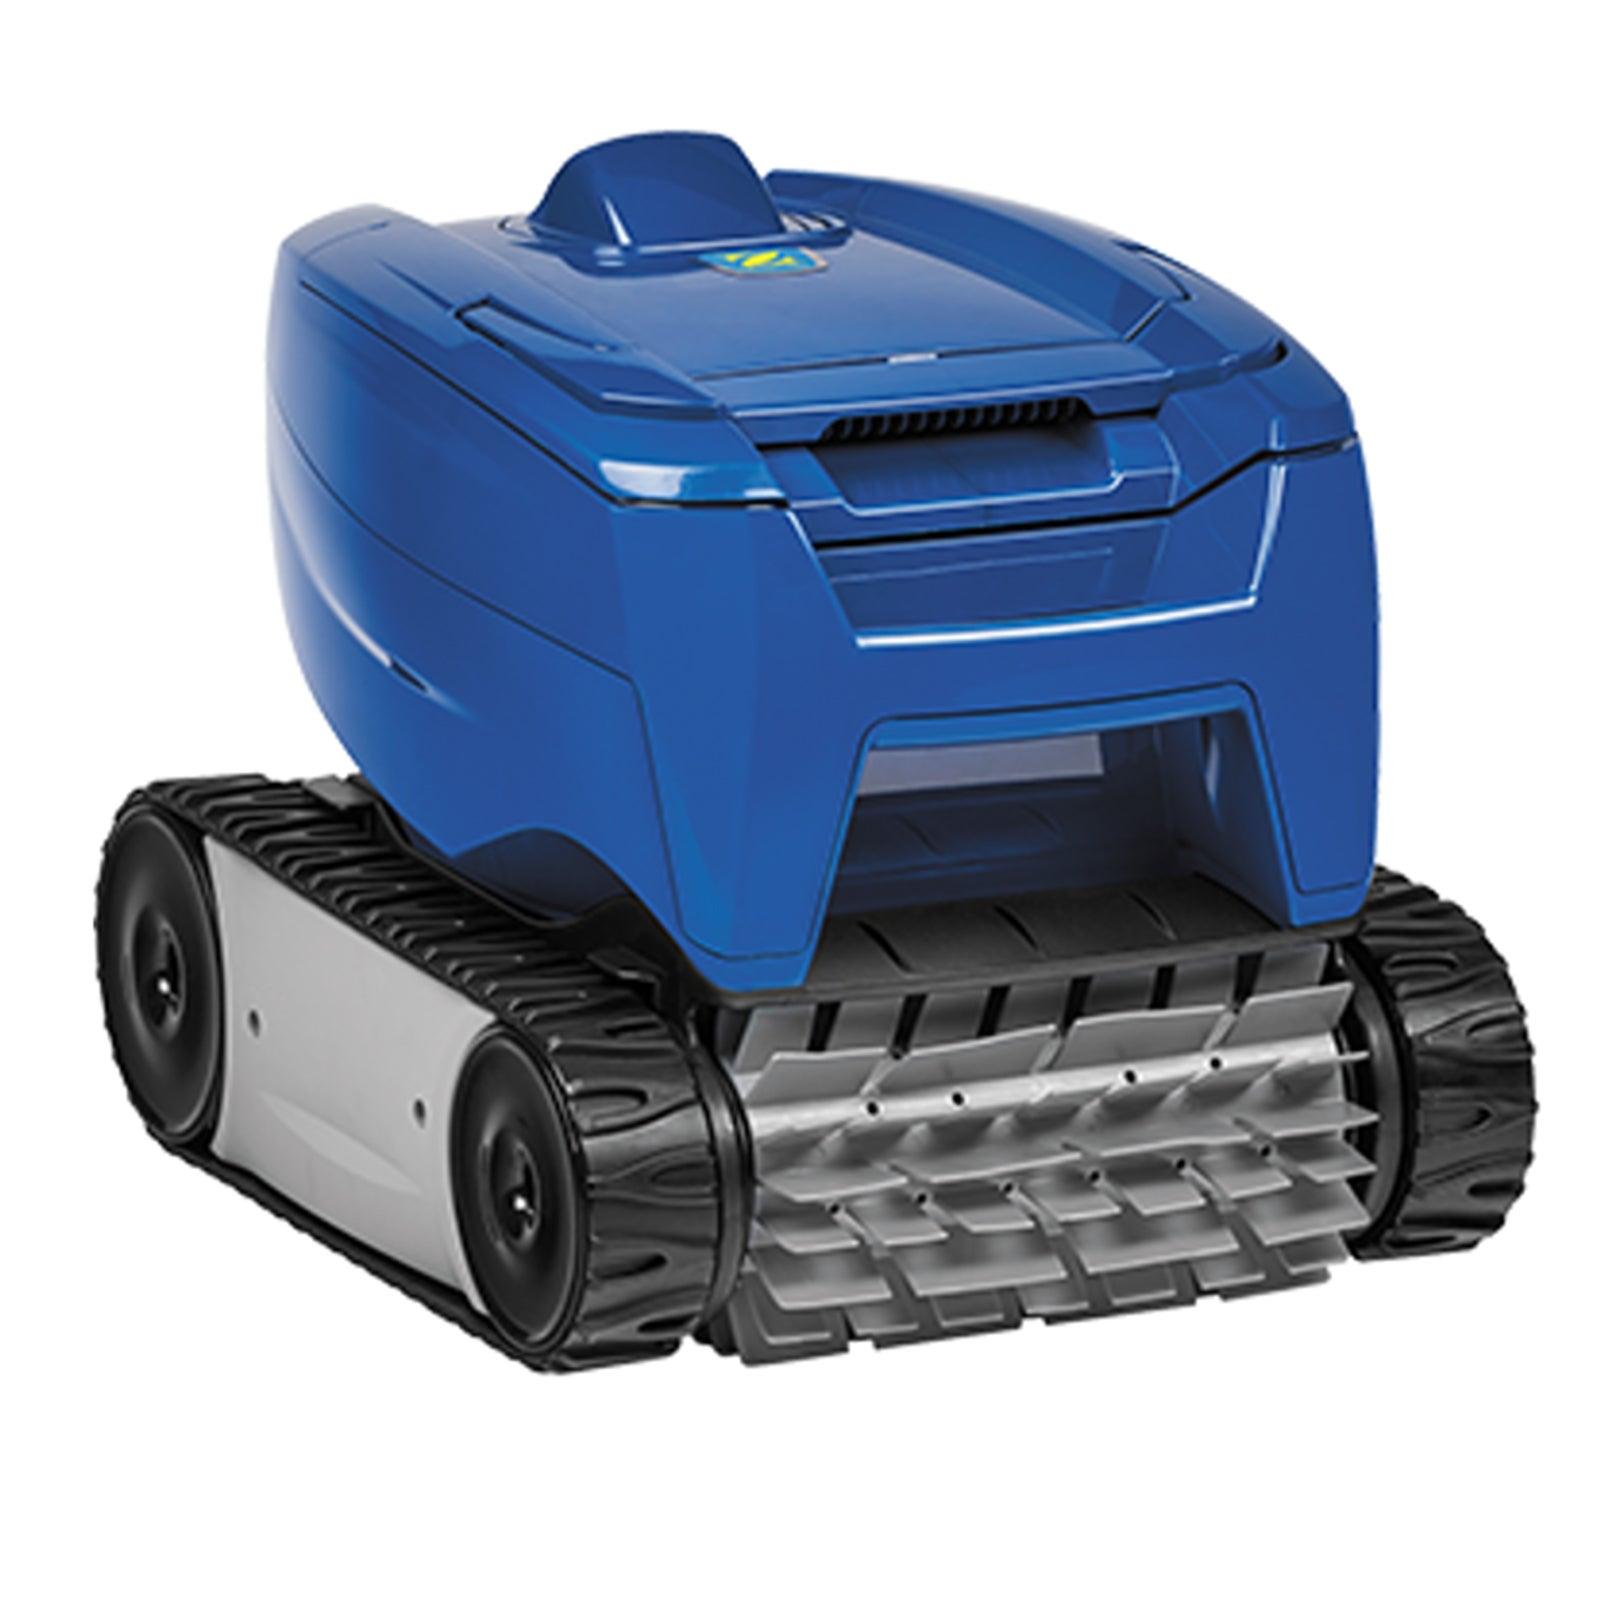 Zodiac Tornax TX20 Robotic Pool Cleaner